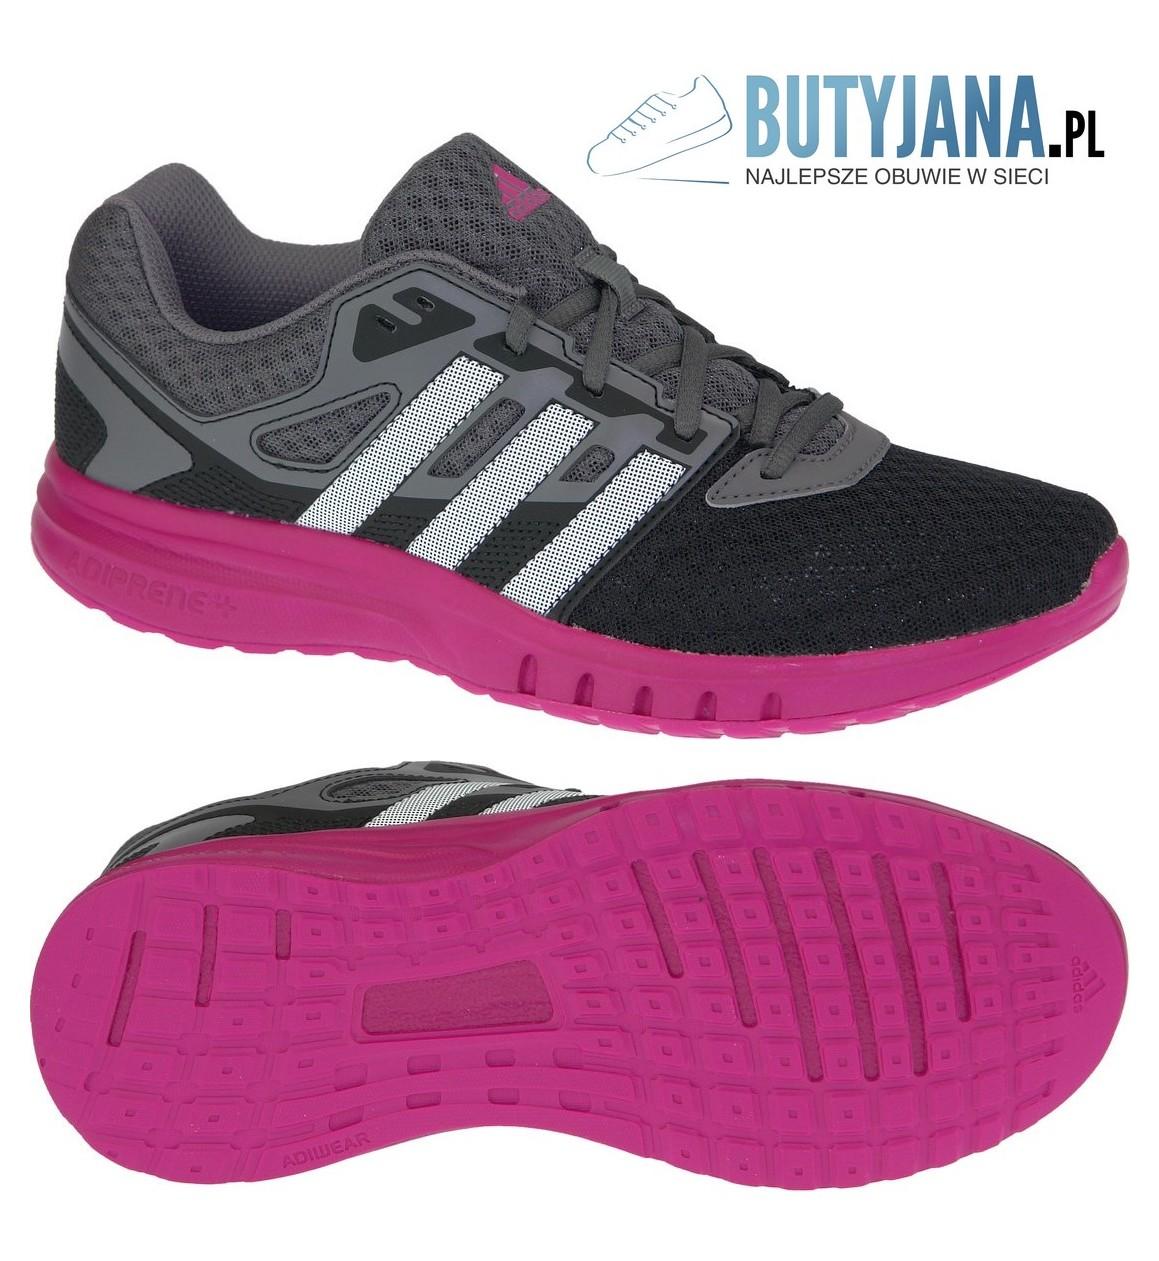 adidasy-damskie-do-biegania-nike-adidas